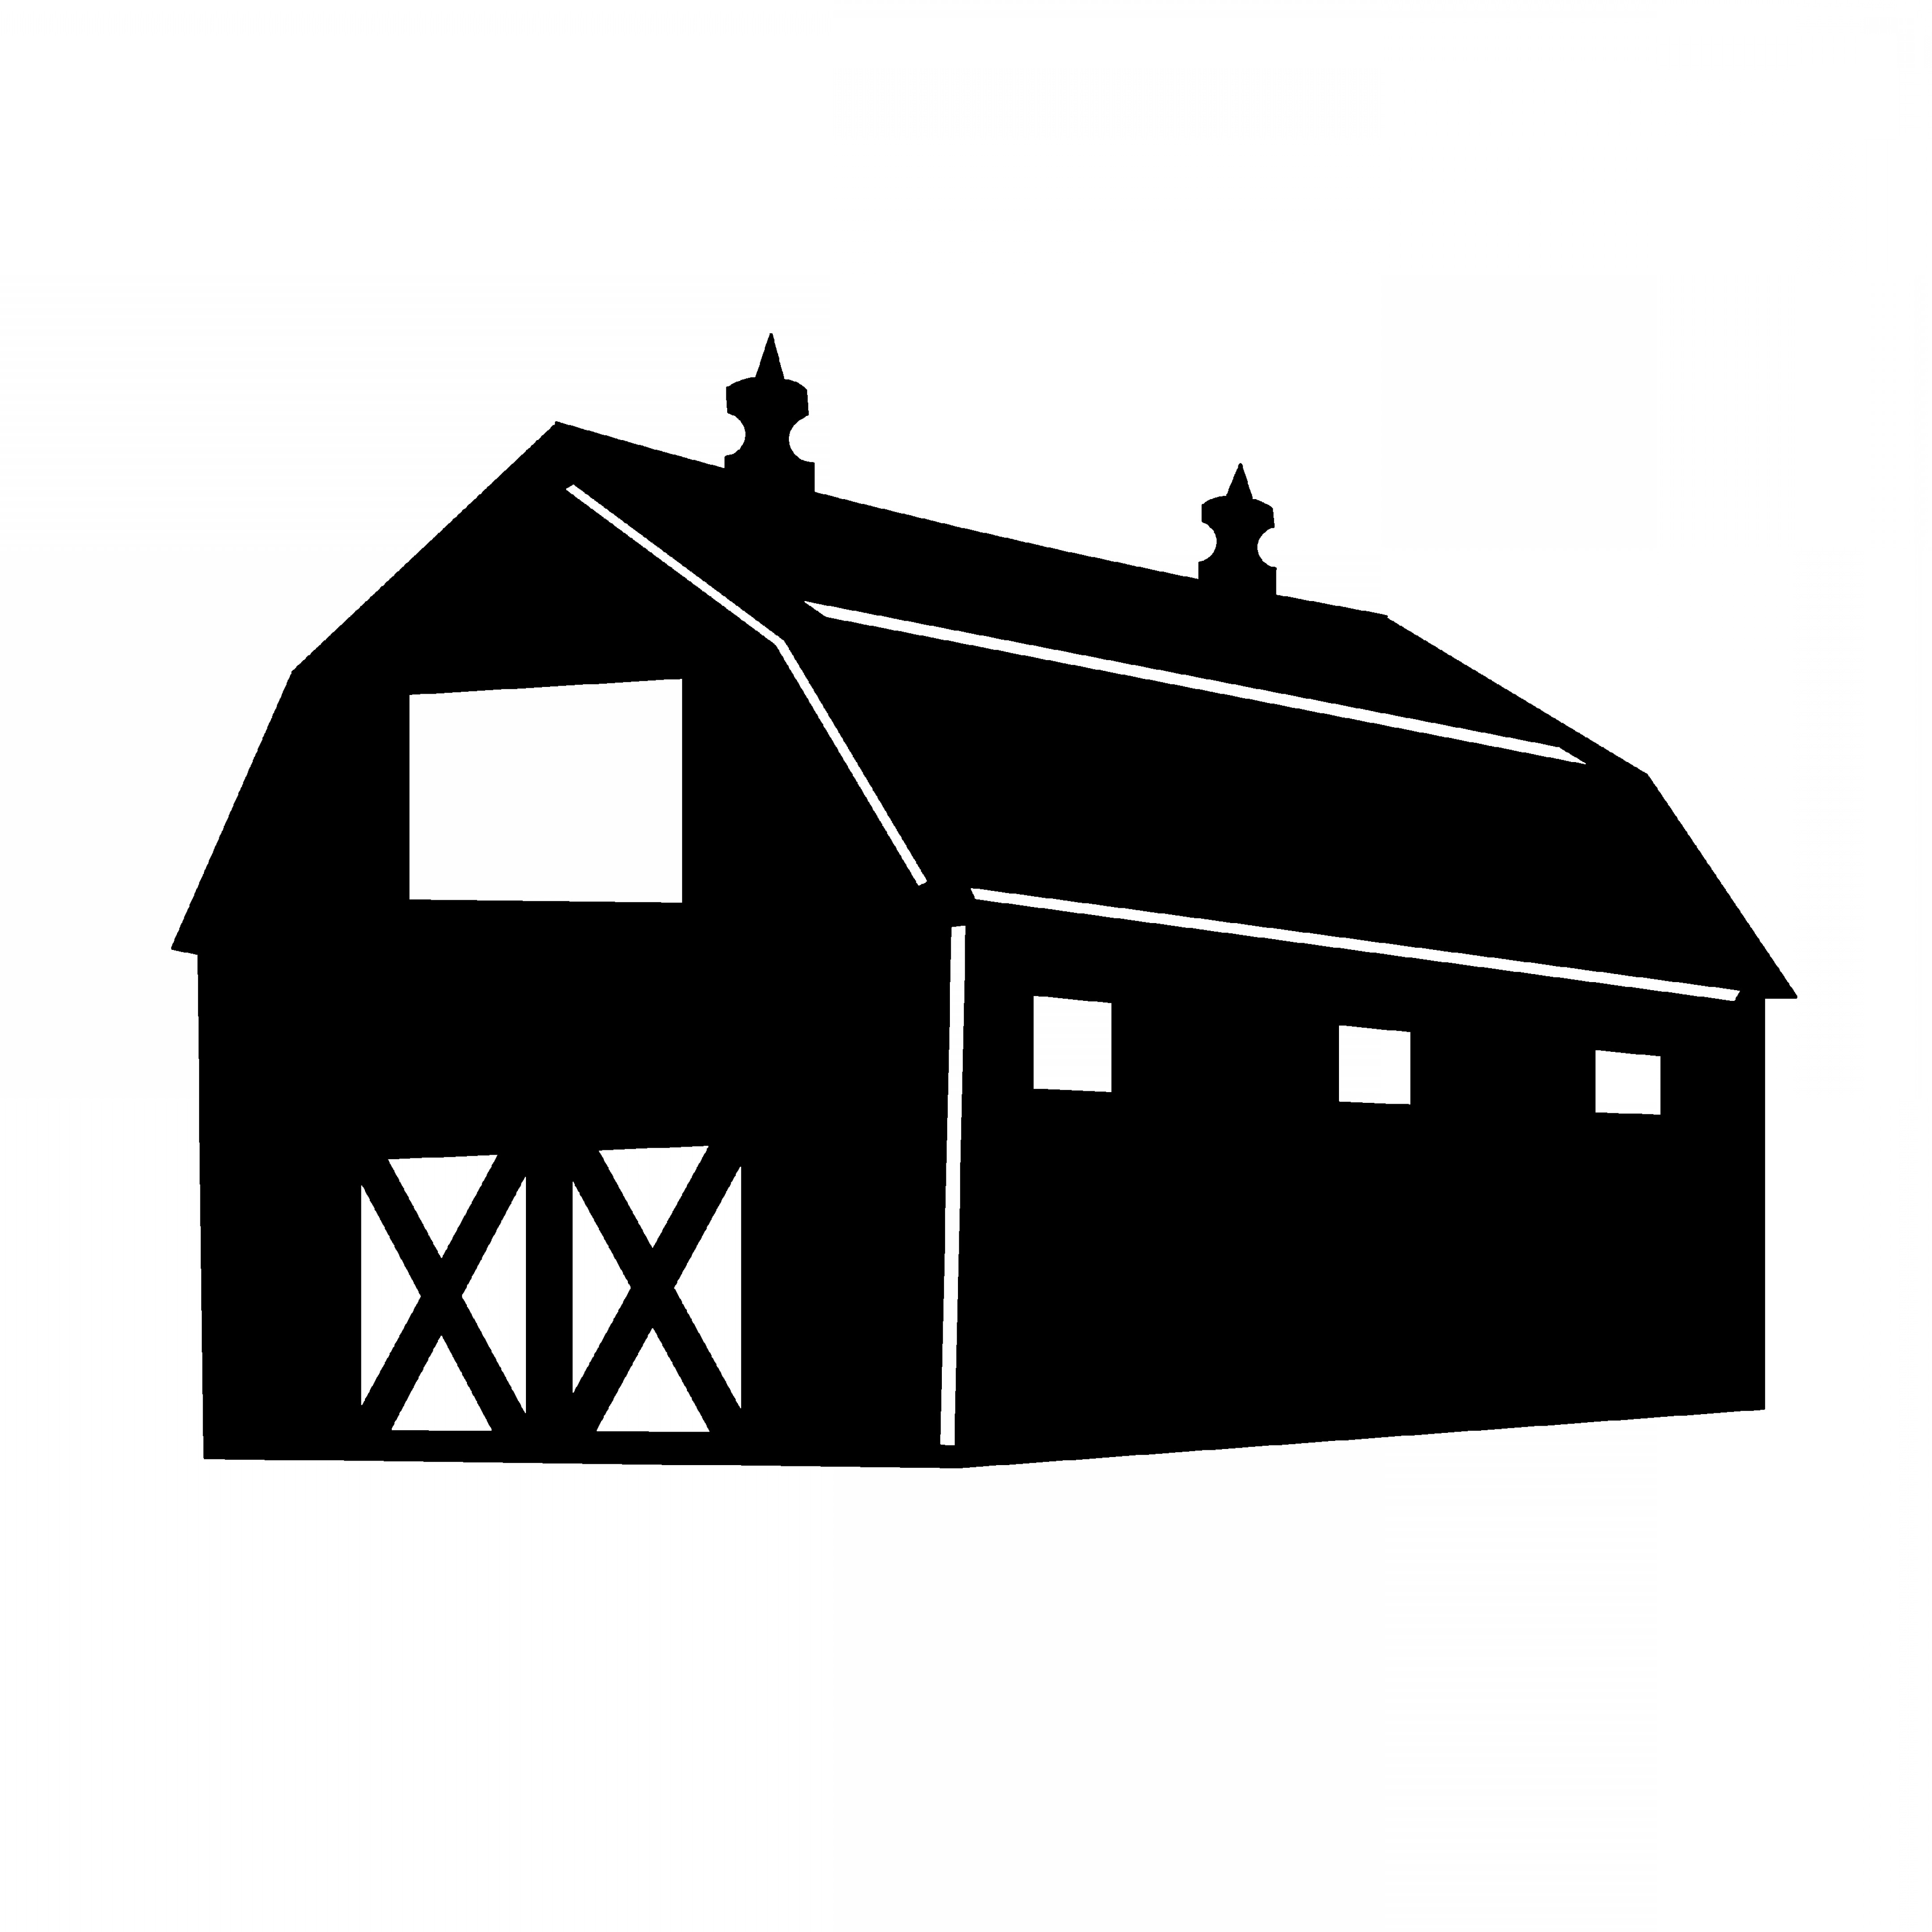 Barn Silhouette Vector at GetDrawings | Free download